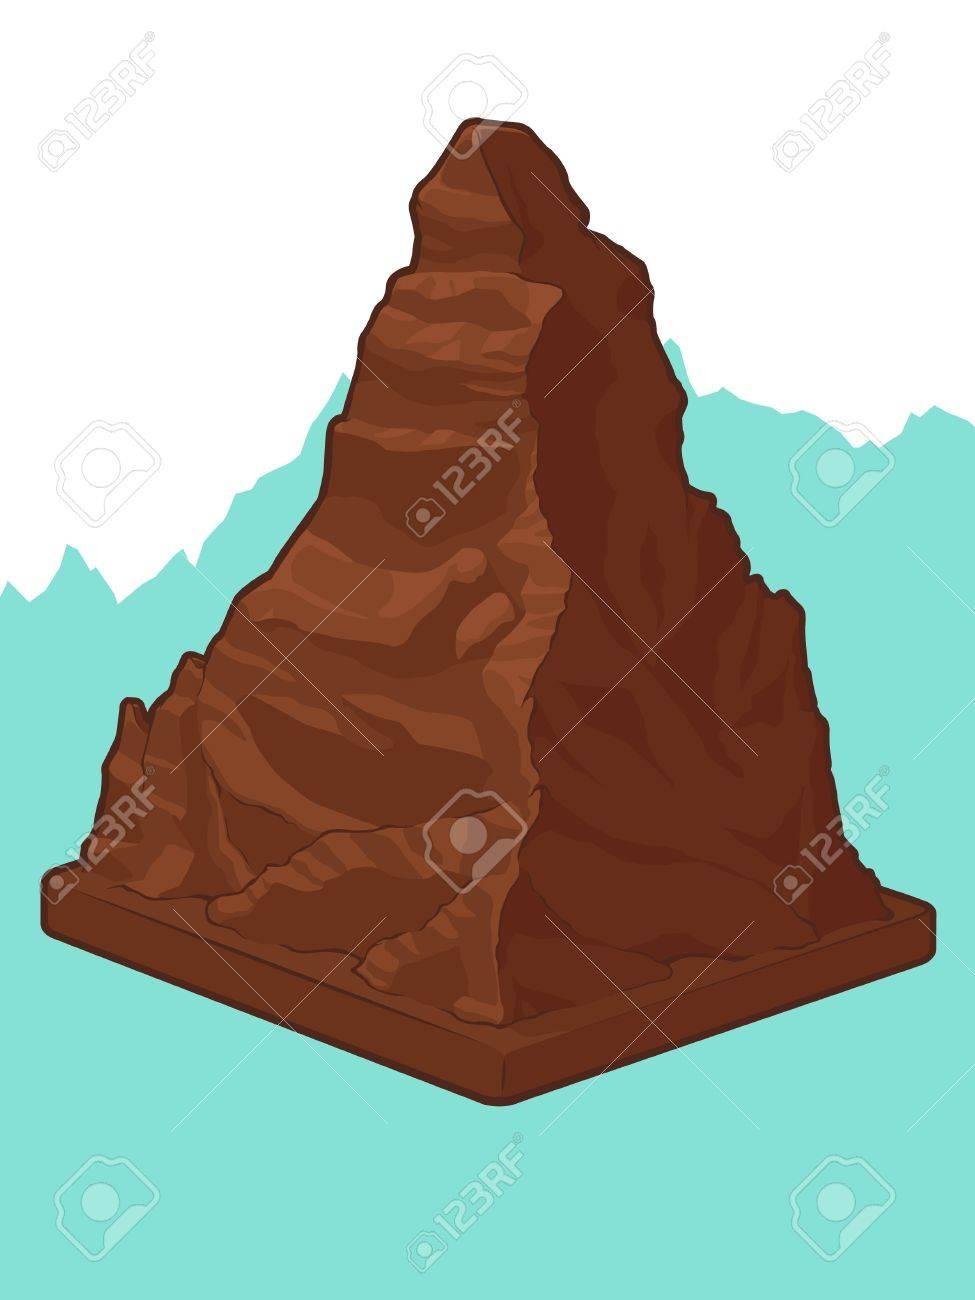 Swiss Chocolate in Matterhorn shape Stock Vector - 16899910